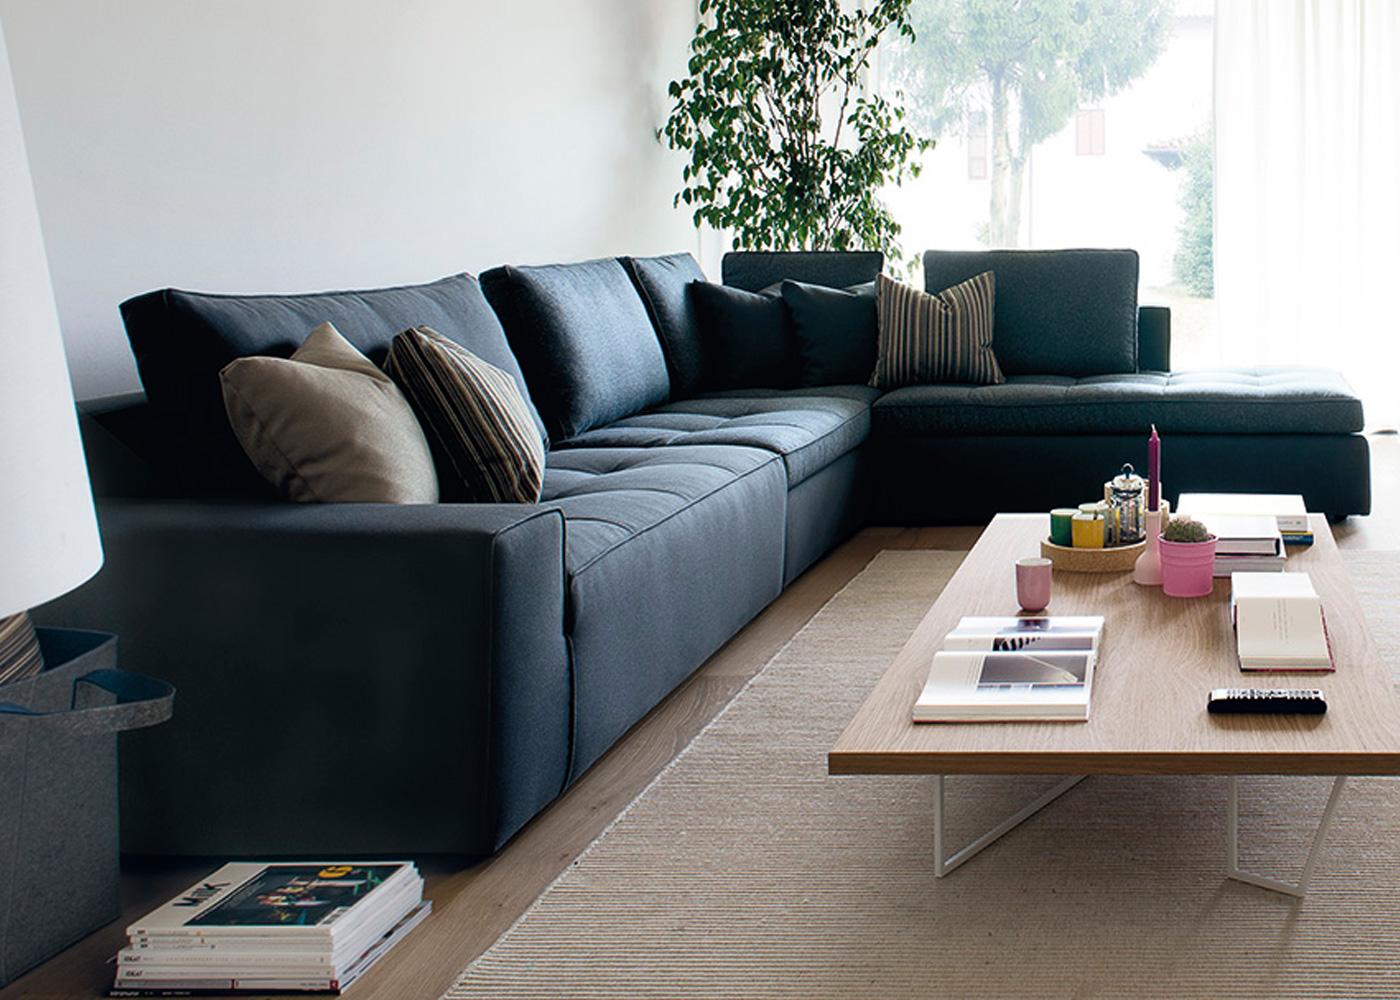 Calligaris Lounge Sofa  Midfurn Furniture Superstore